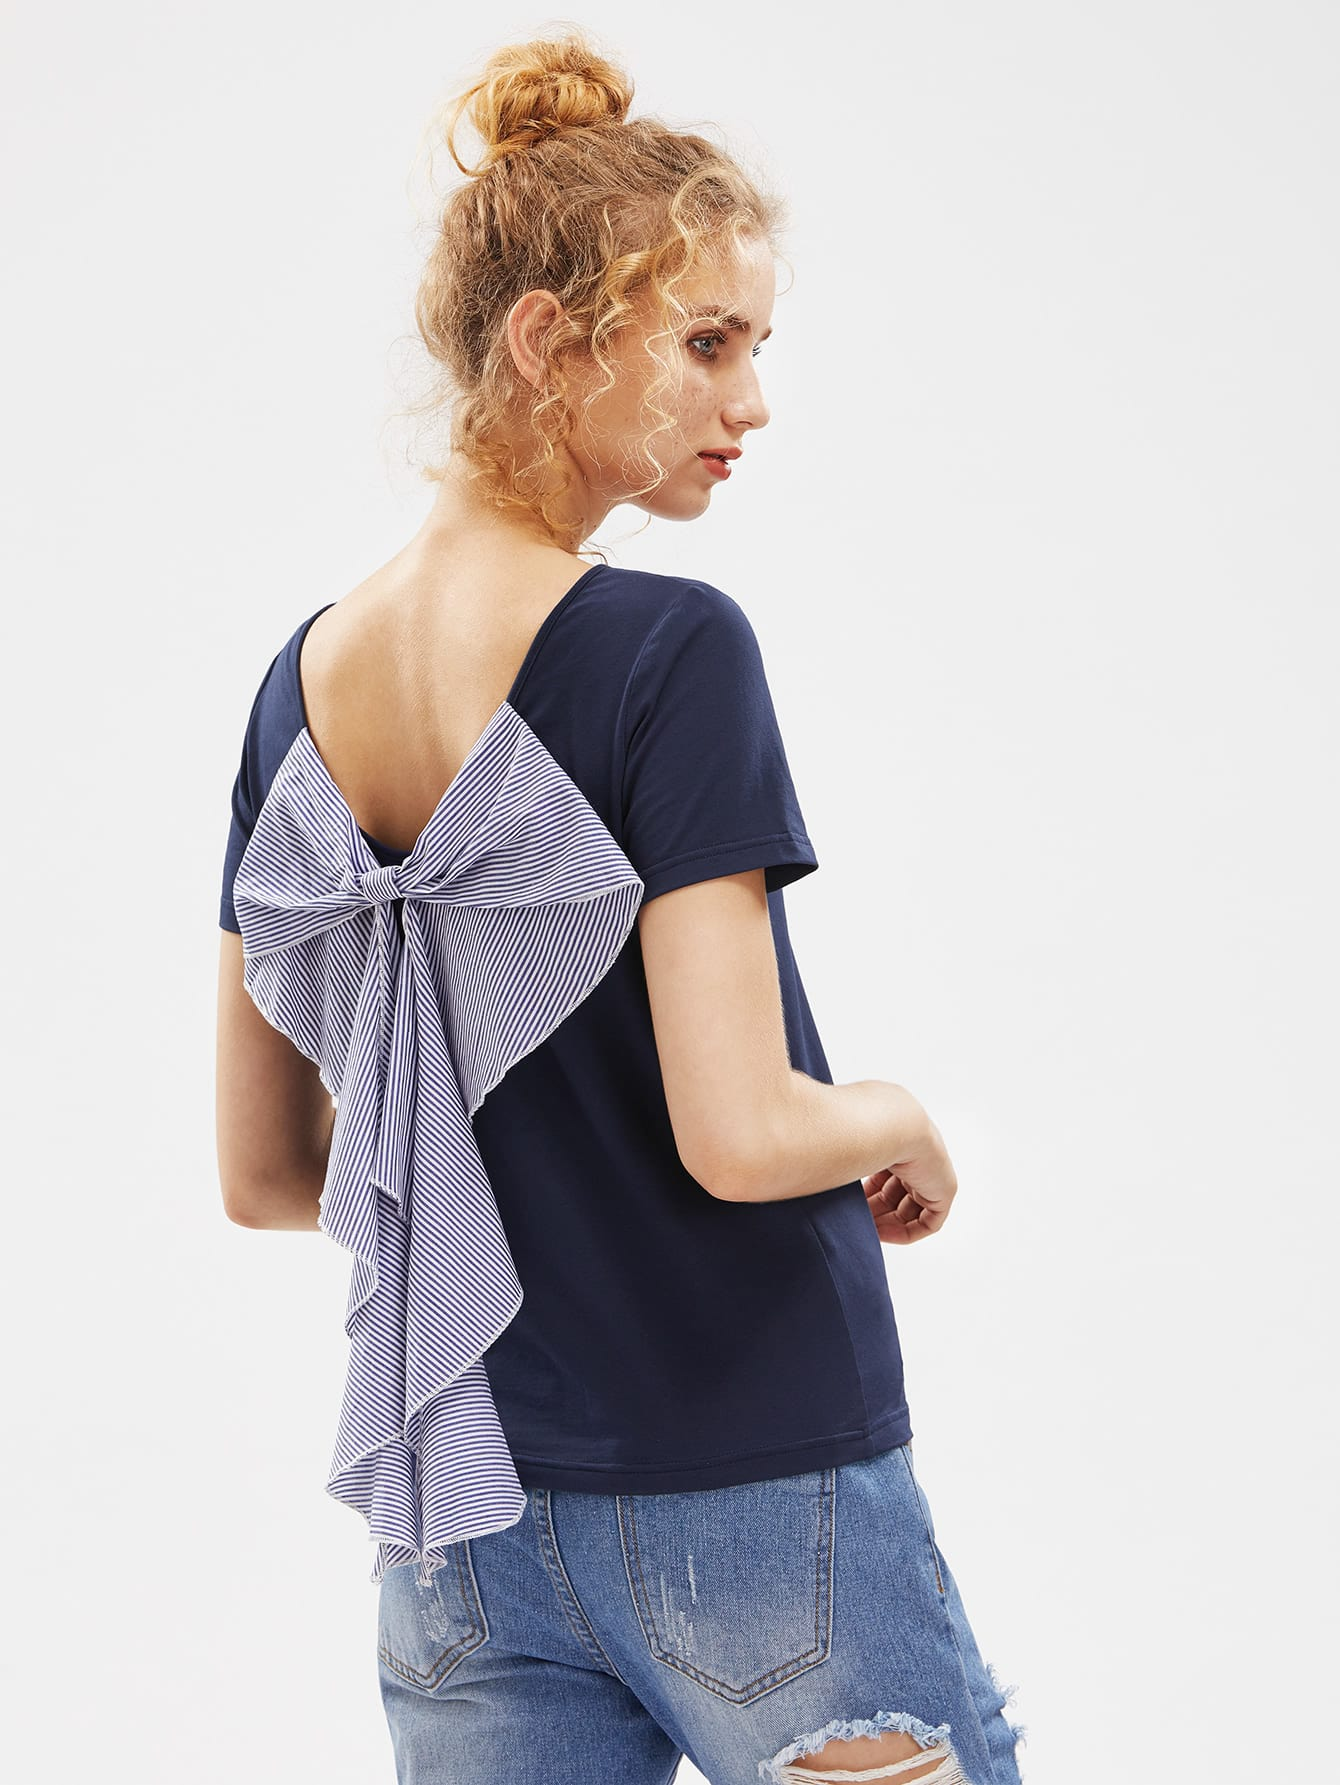 1875a01a38 KOZ1.com | Shop for latest women's fashion dresses, tops, bottoms.